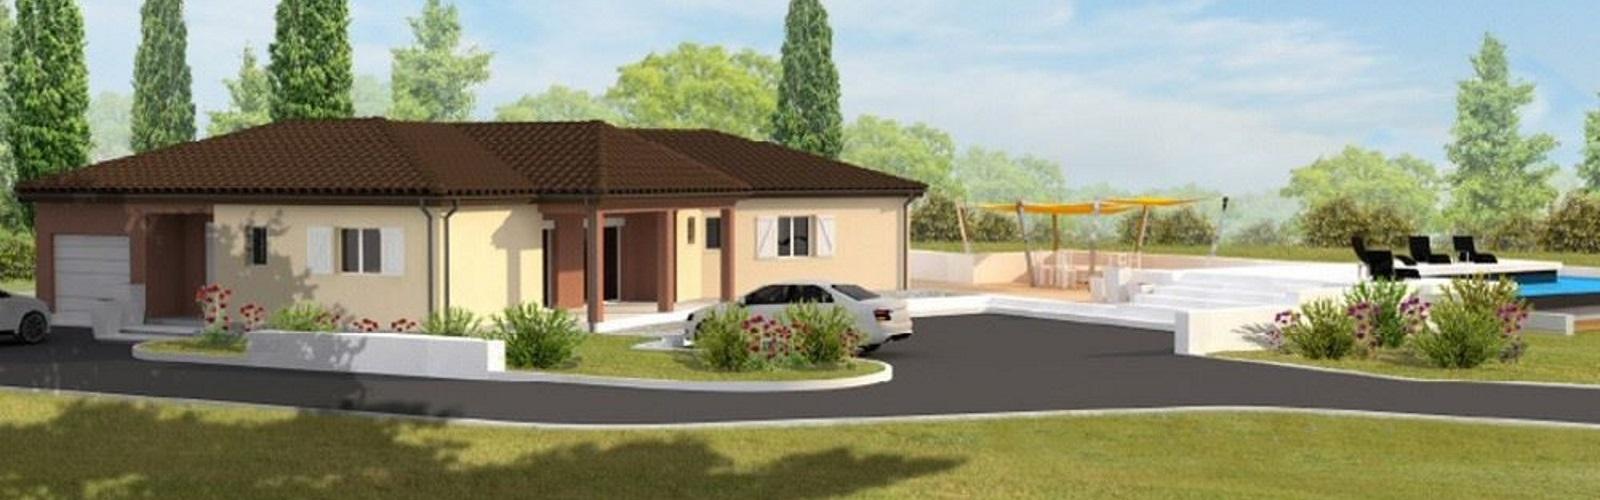 constructeur de maison individuelle tarn et garonne. Black Bedroom Furniture Sets. Home Design Ideas